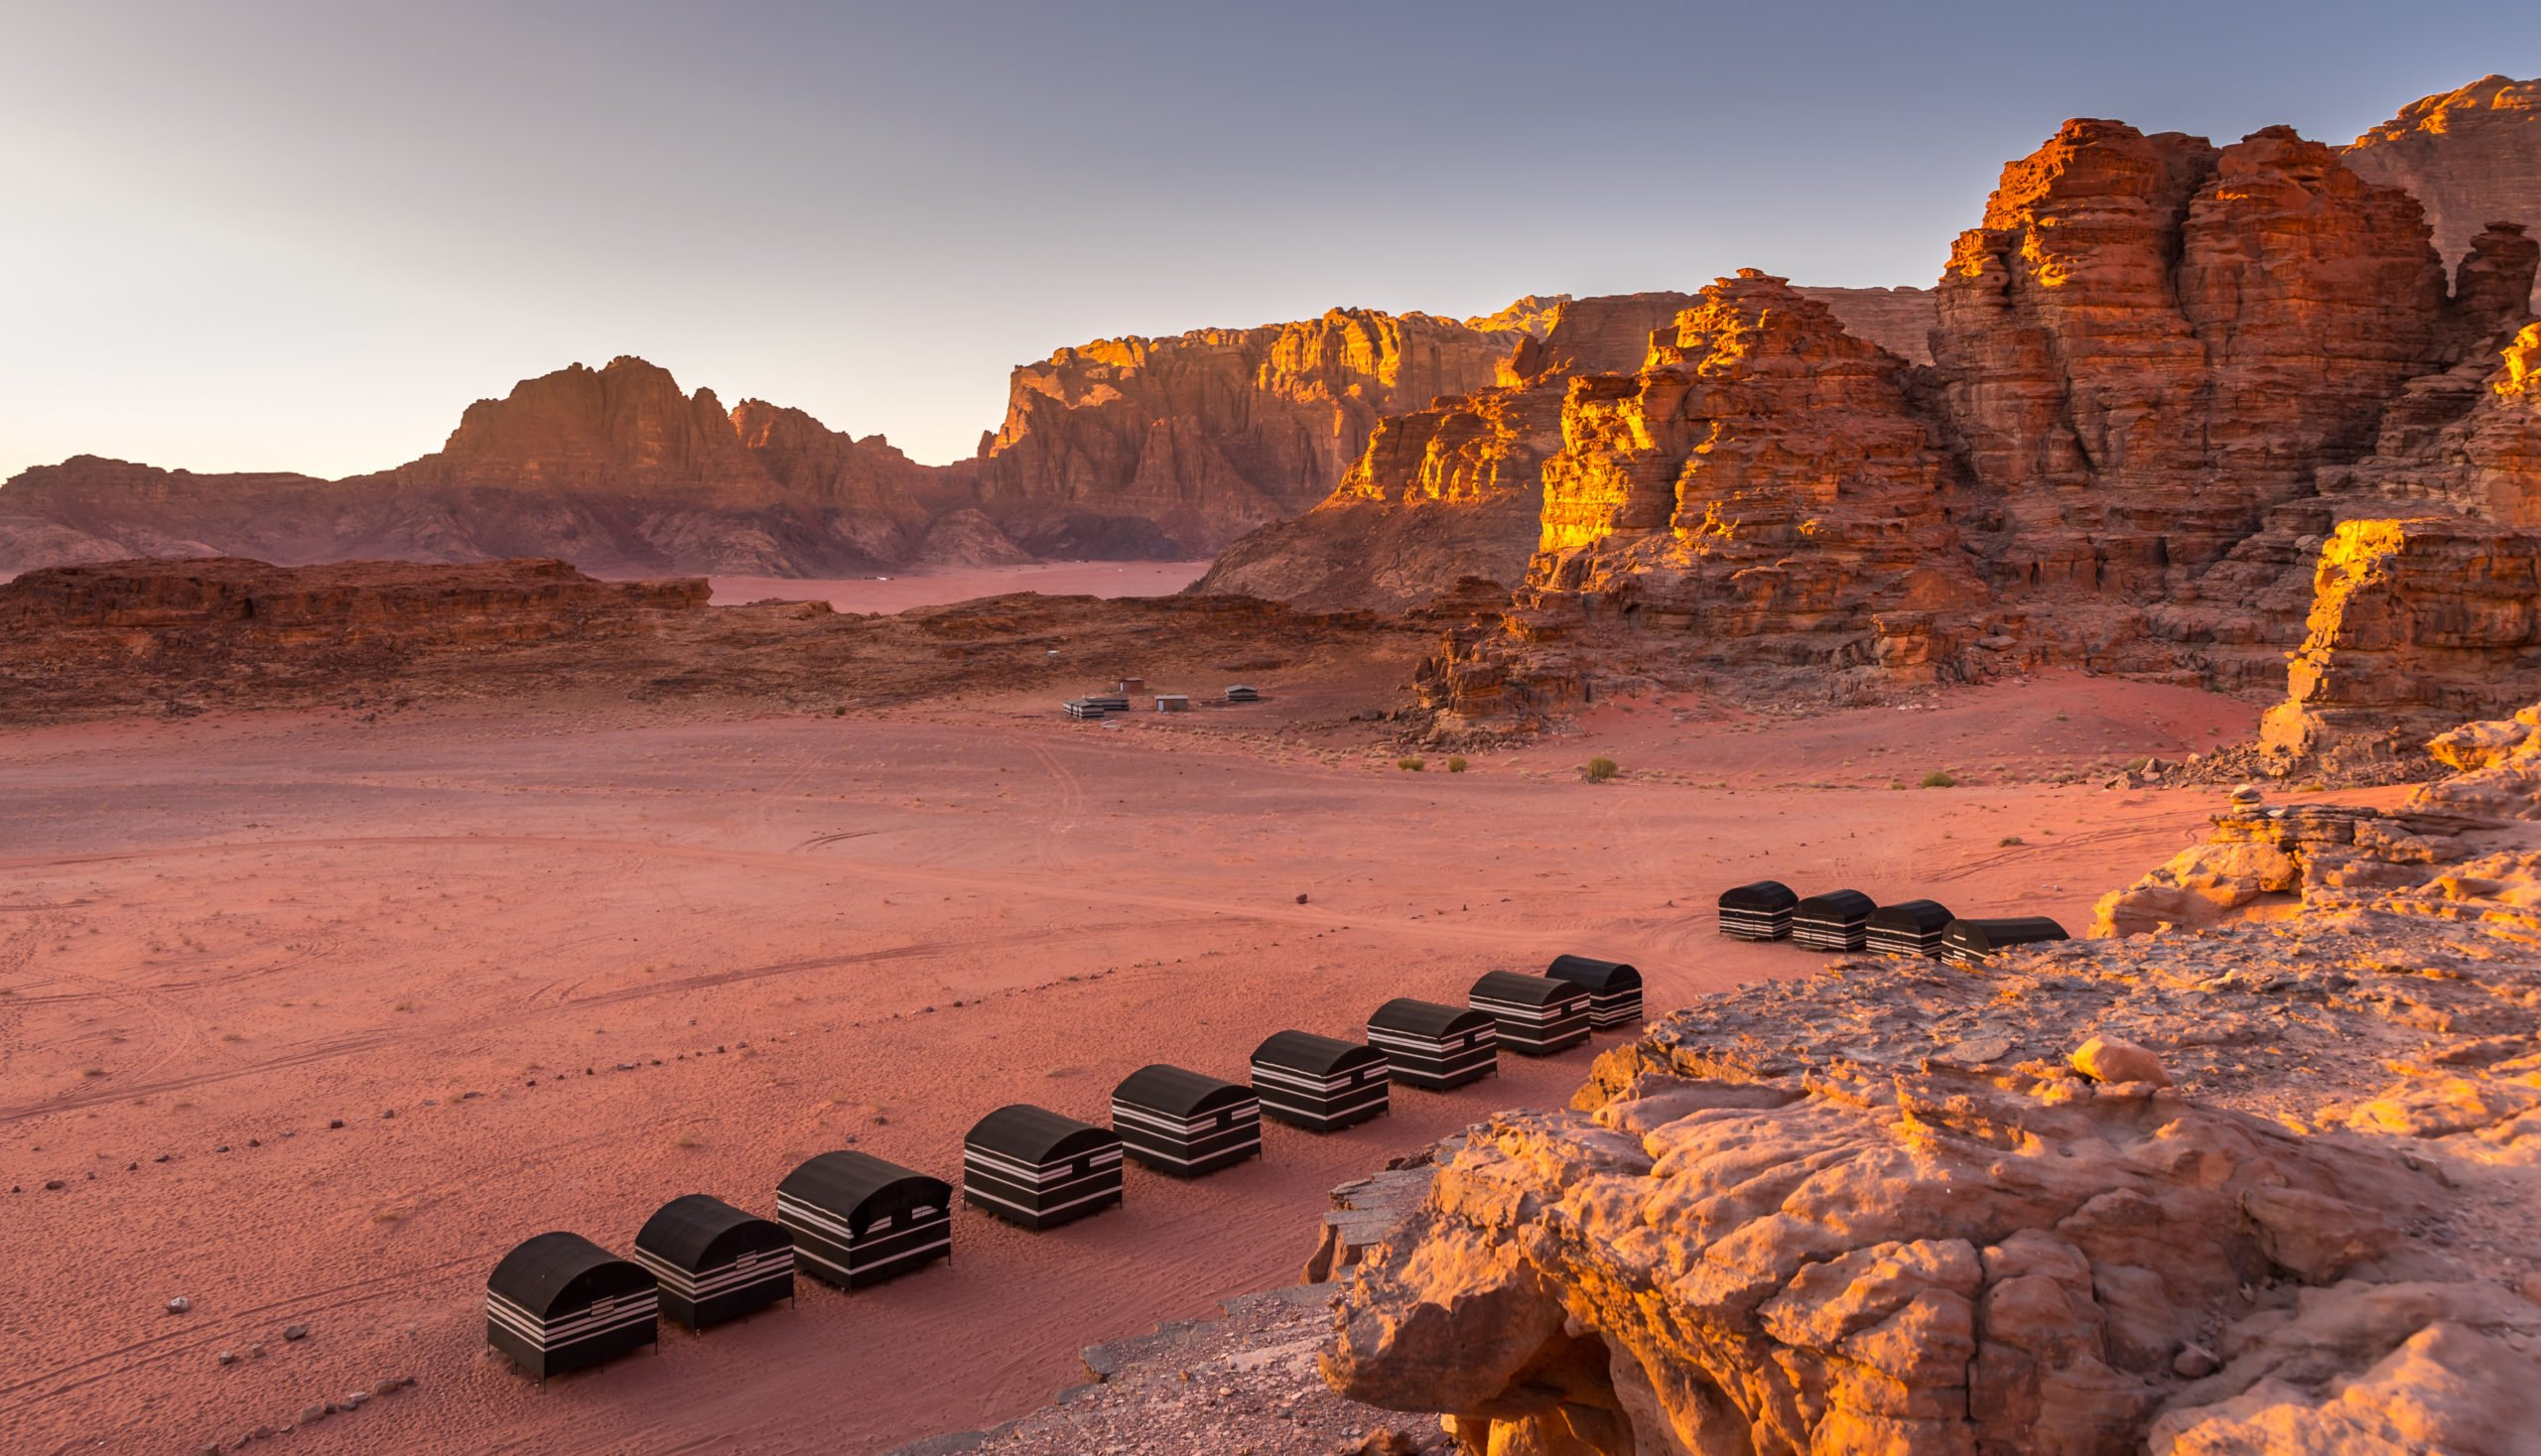 Sleep Under Starts In Wadi Rum On Ther 13 Day Highlights Of Israel, Saudi Arabia & Jordan Package Tour